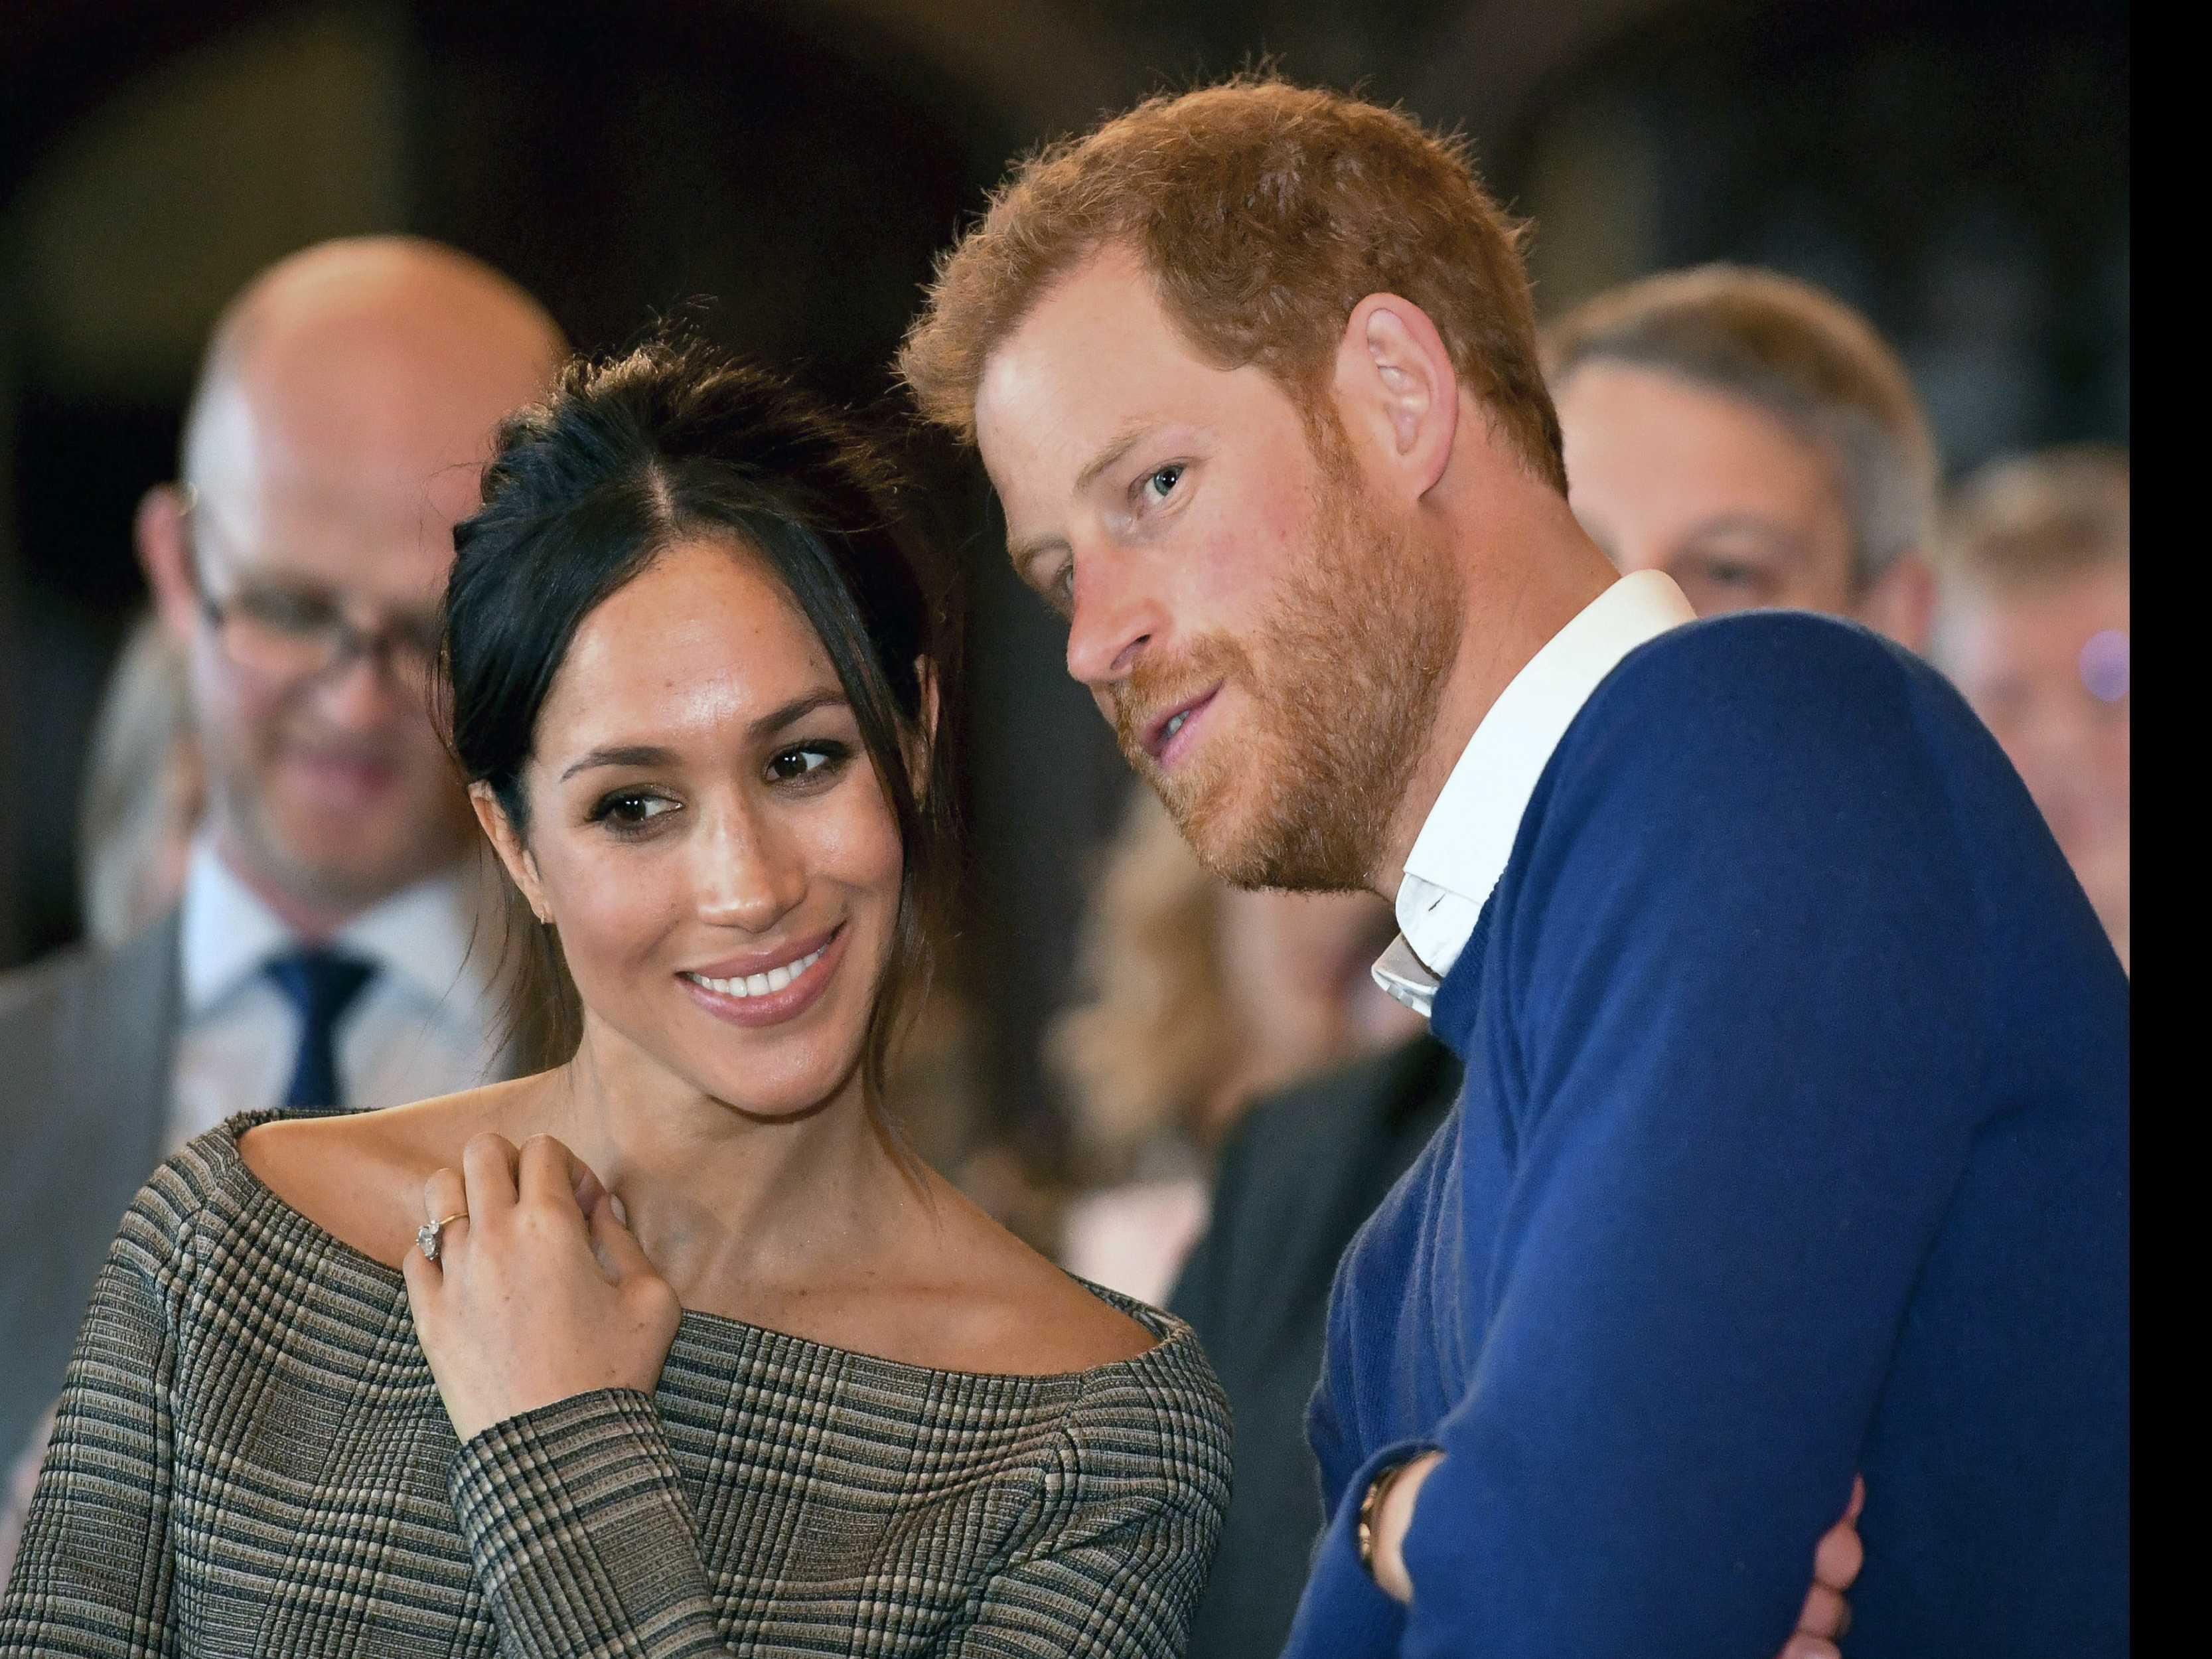 What Will Meghan Wear? Royal Wedding Dress a UK Secret